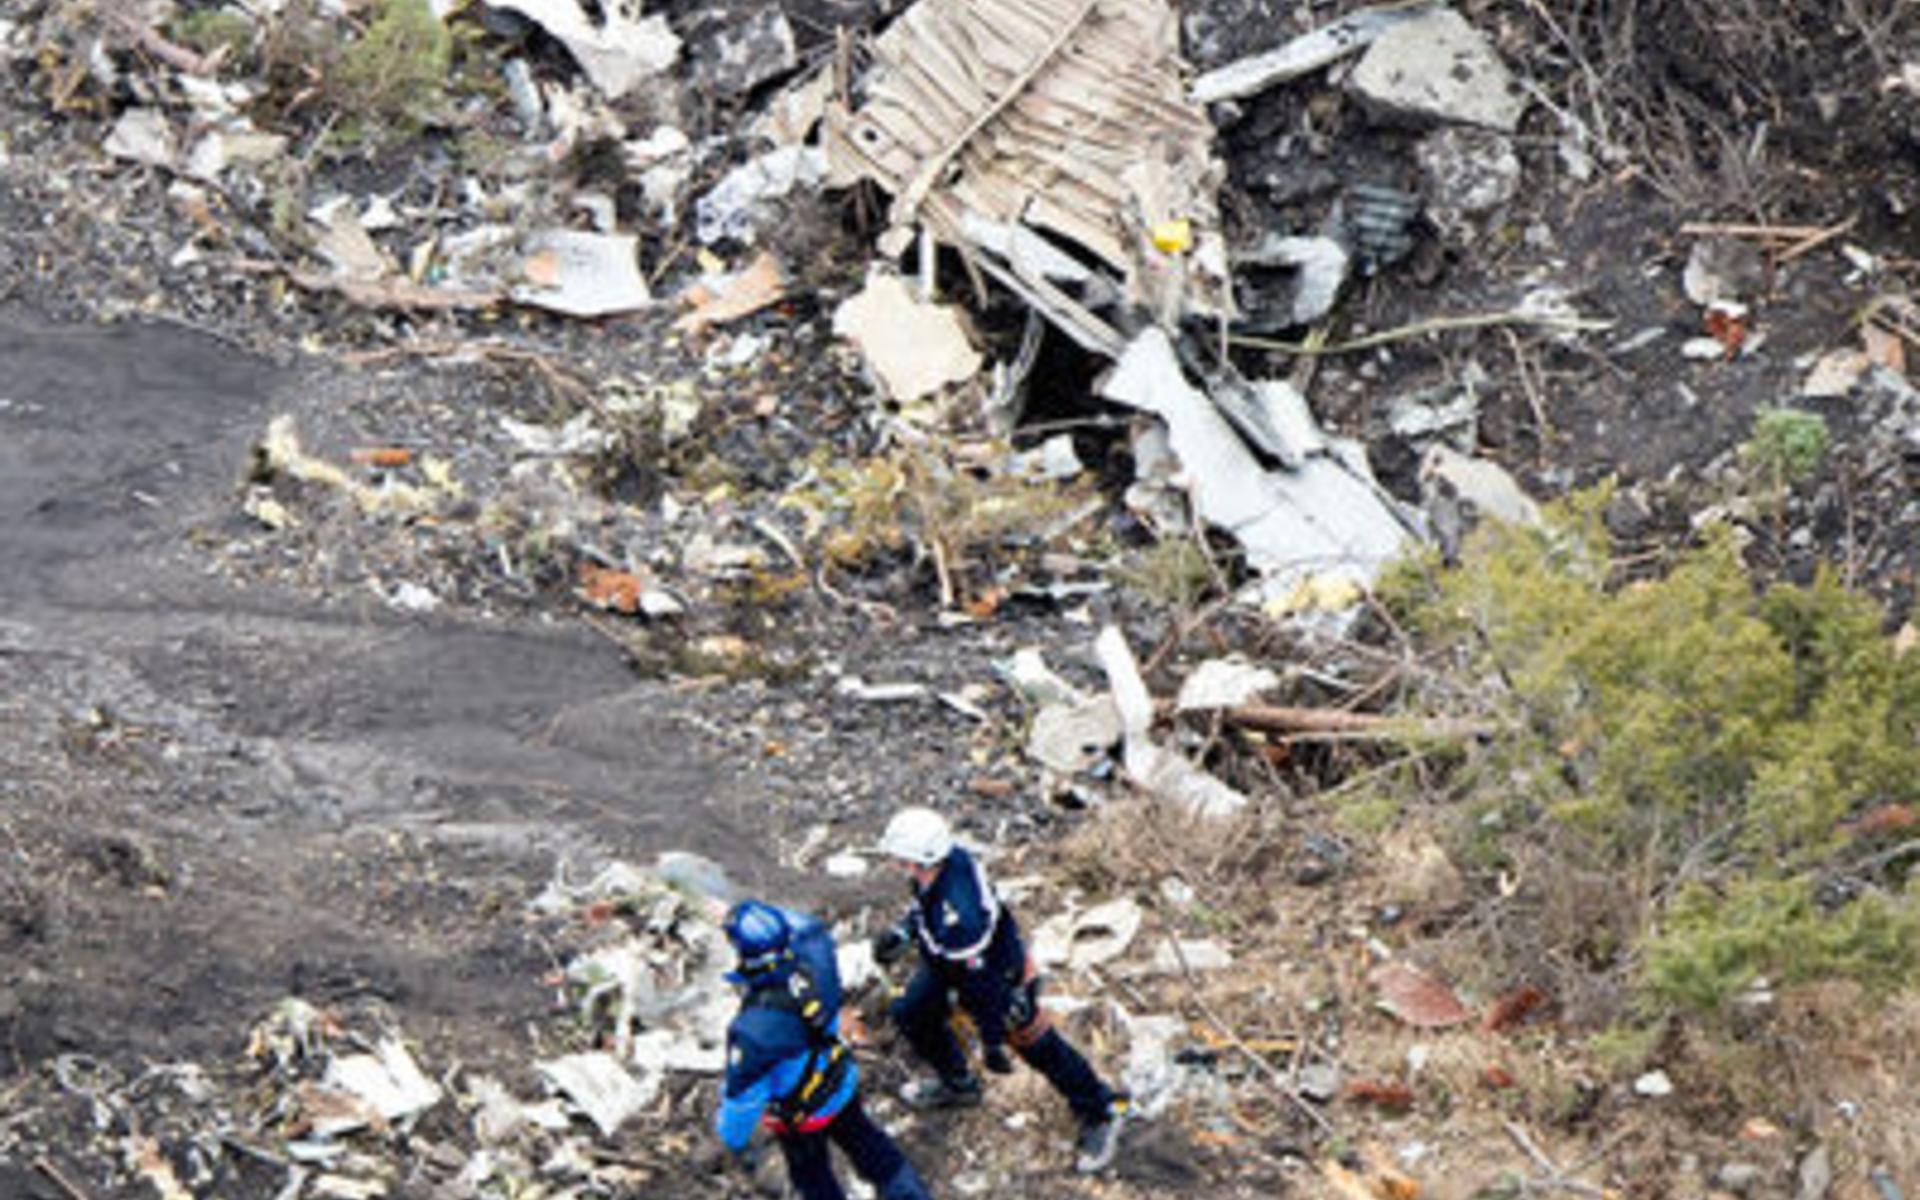 Air france crash victims photos 1921 (2018) - IMDb